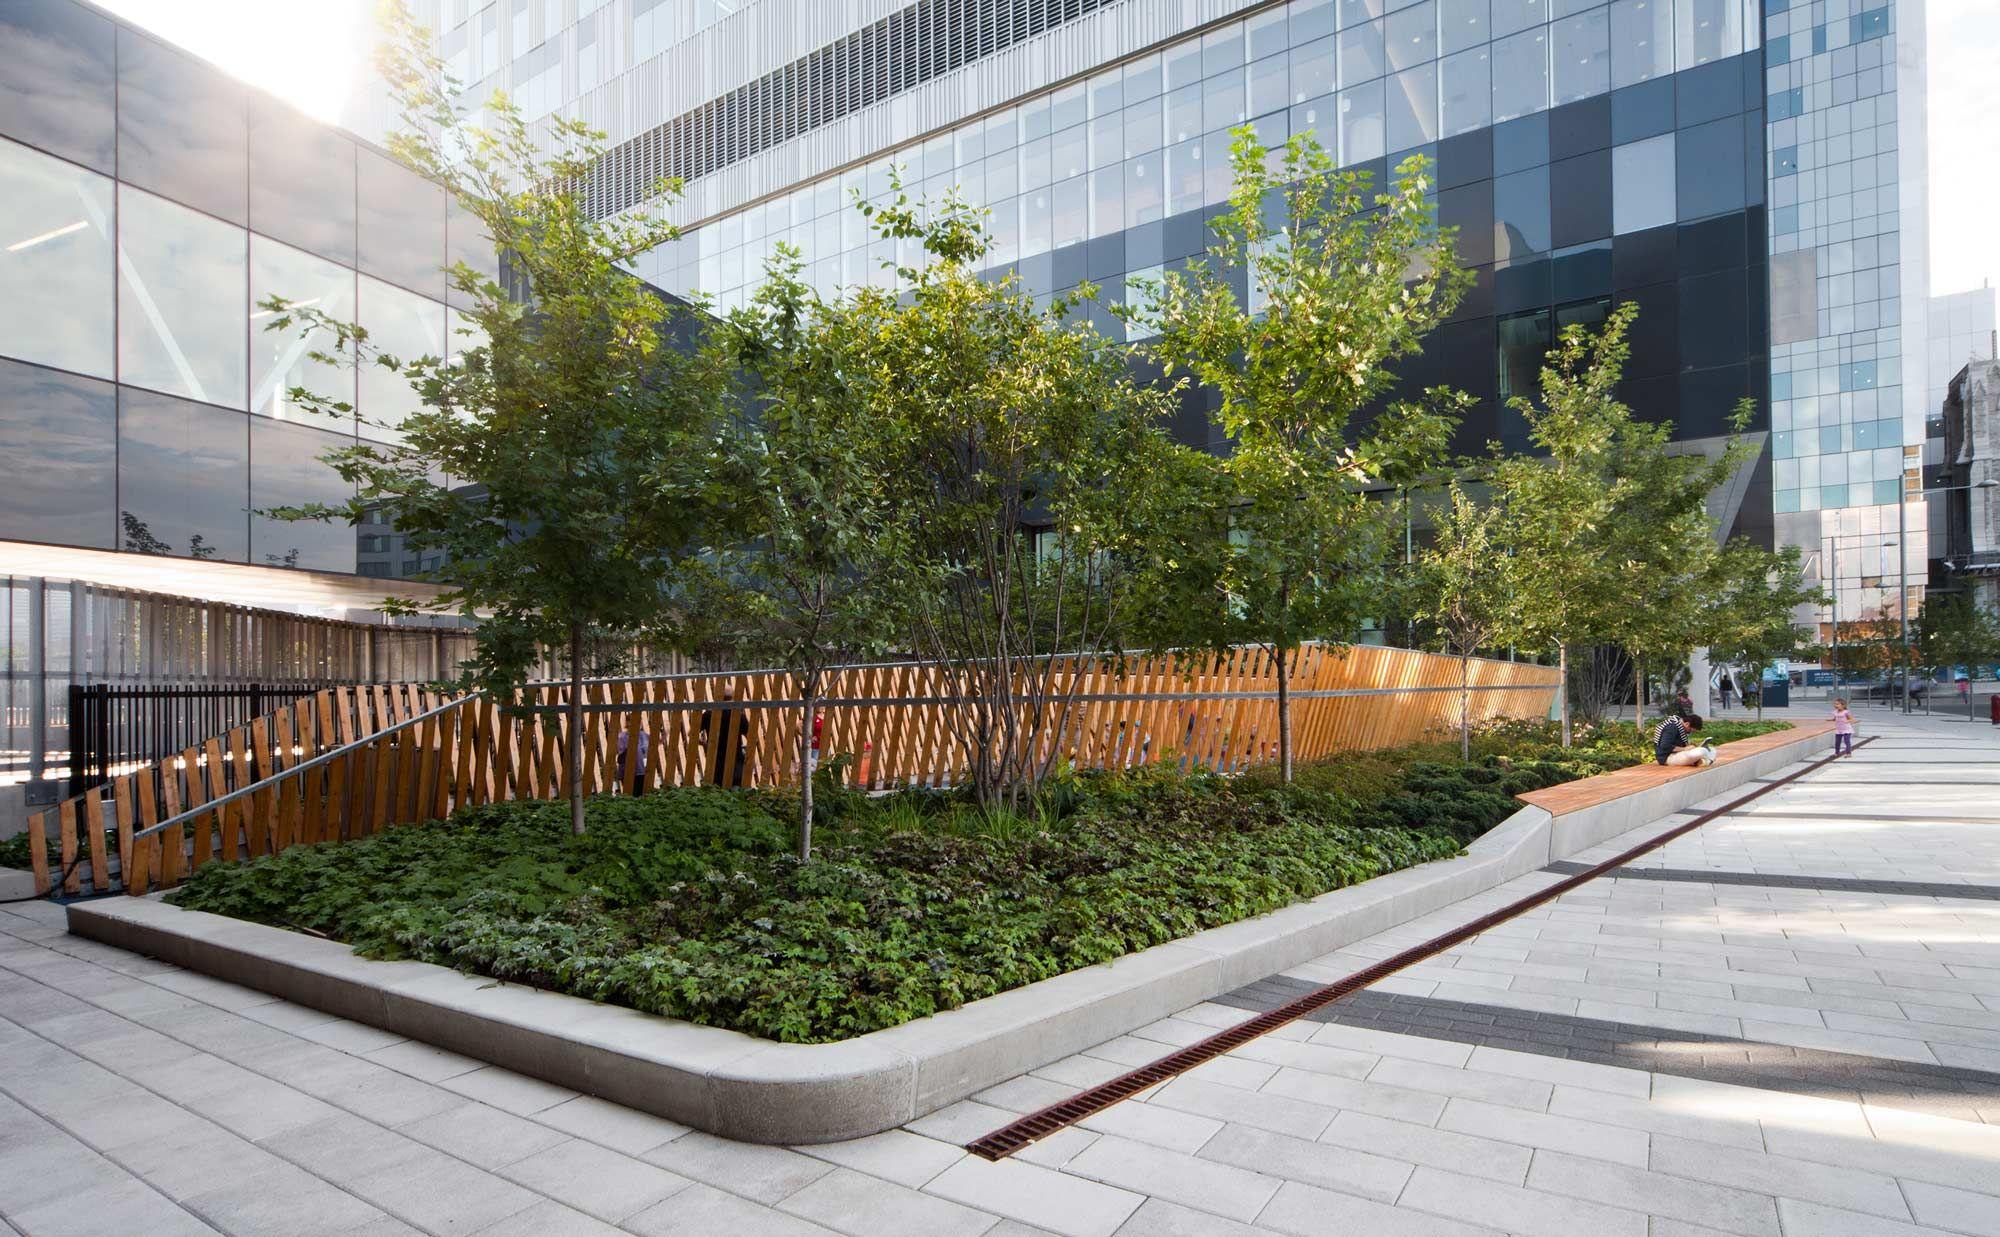 STEVE-MONTPETIT-11 « Landscape Architecture Works | Landezine